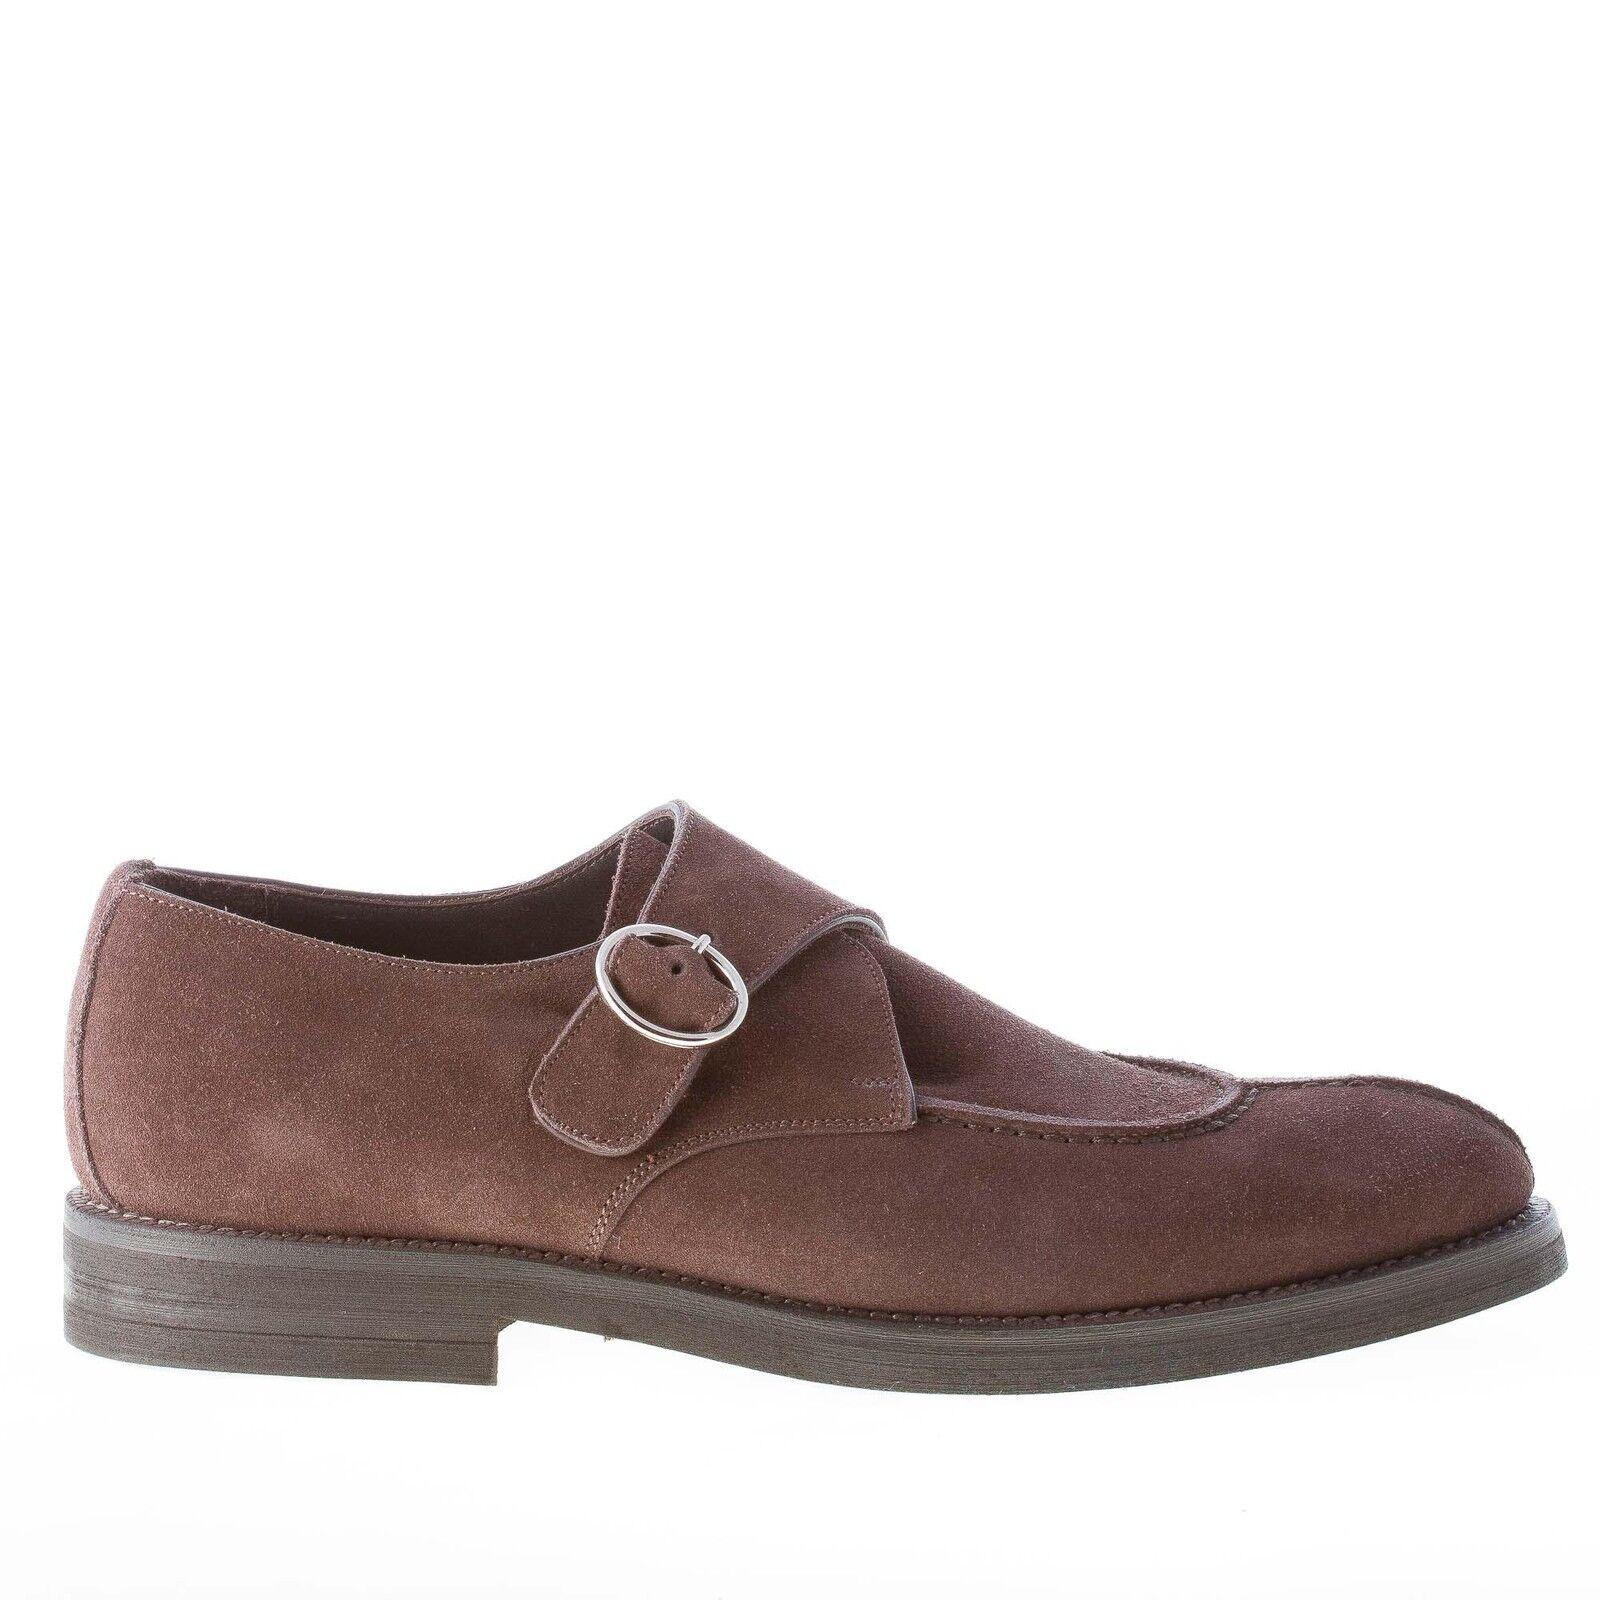 MIGLIORE men shoes made in  Dark brown suede apron toe monk strap